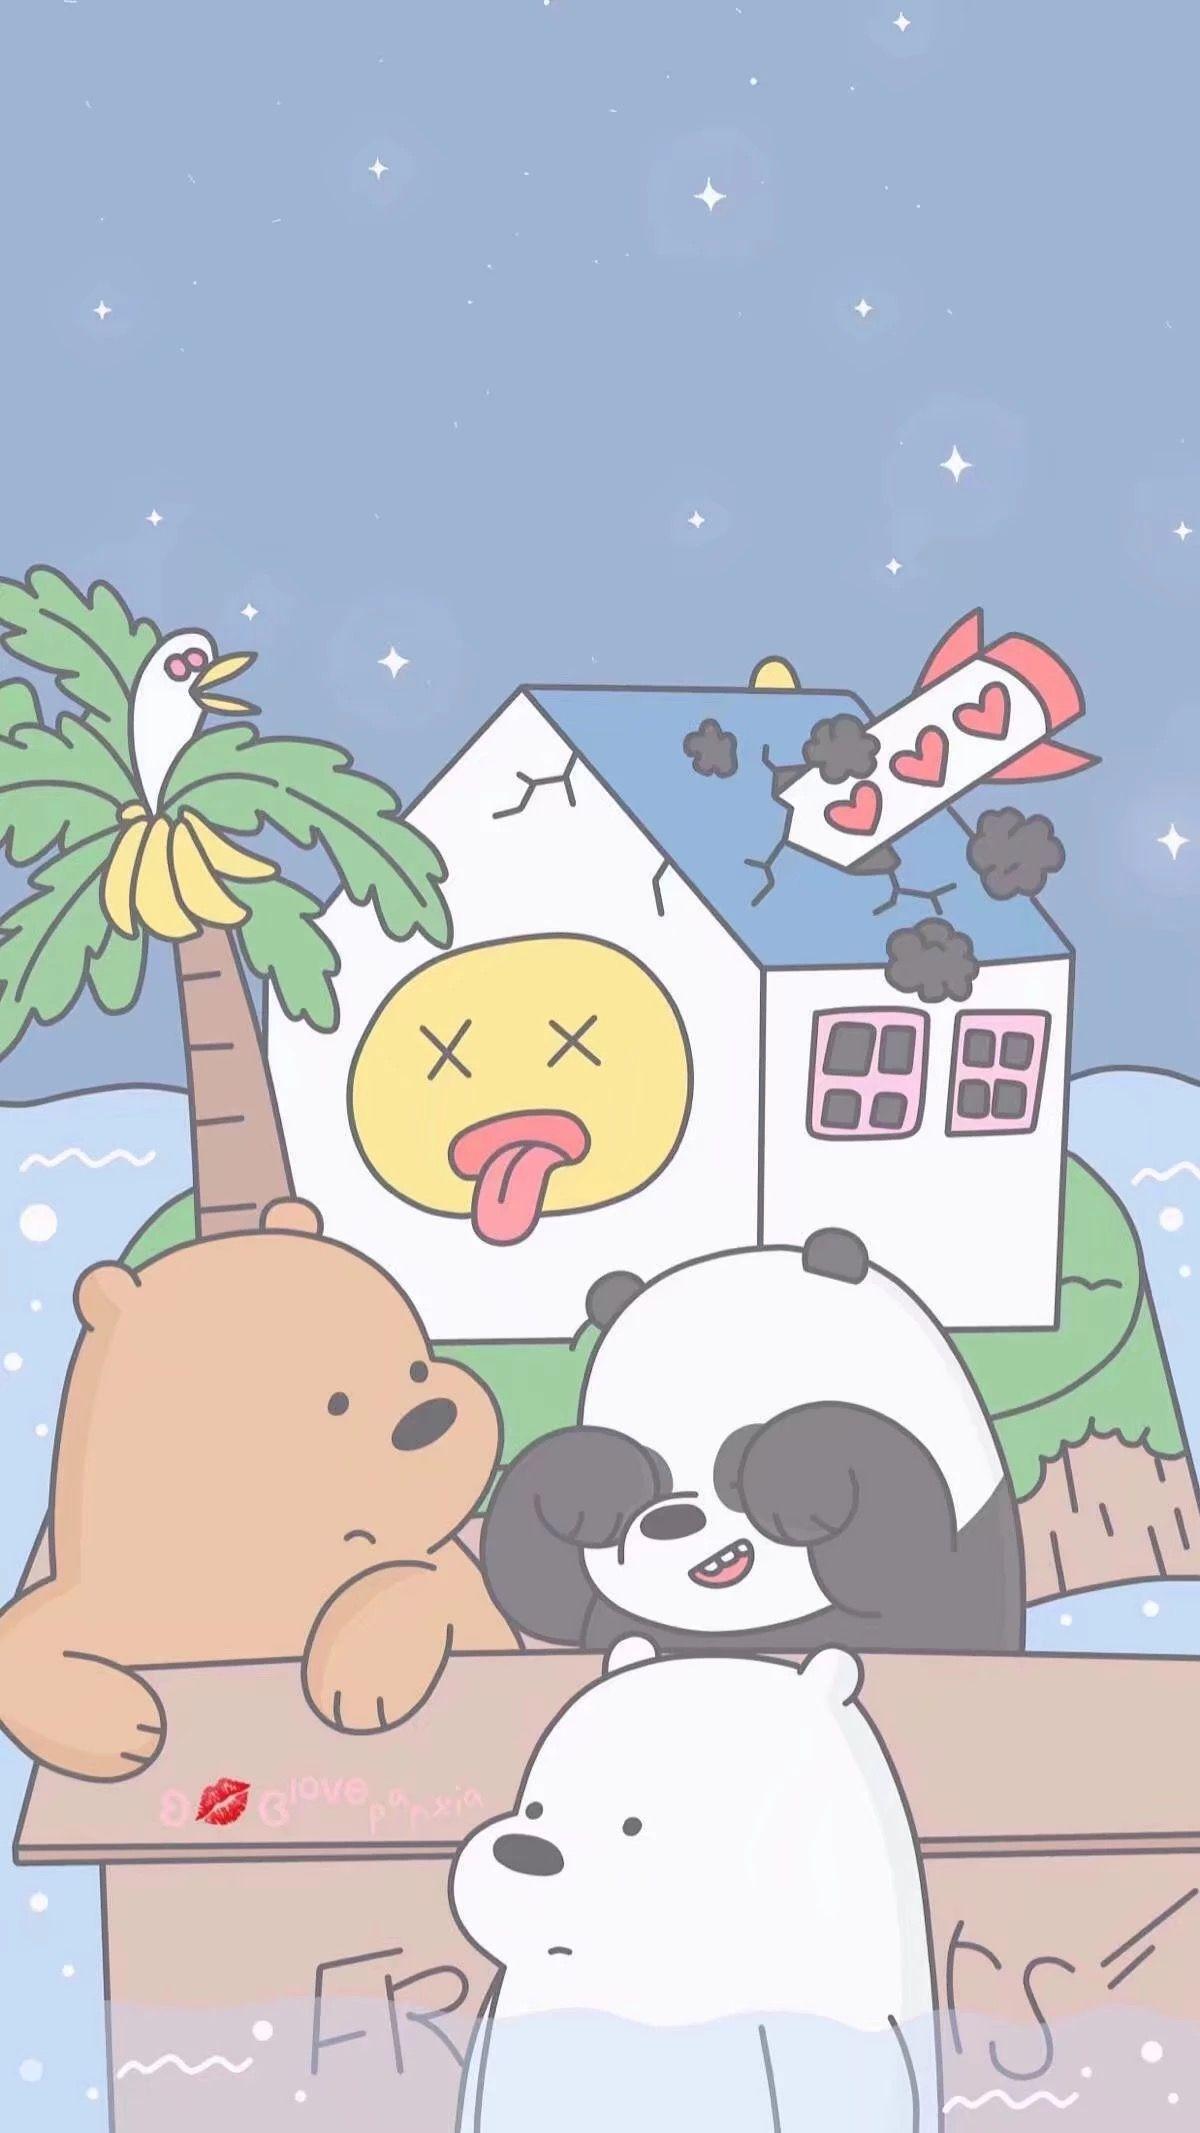 Cute🐼 We Are Bears Team Is Here Guys🙋🏼